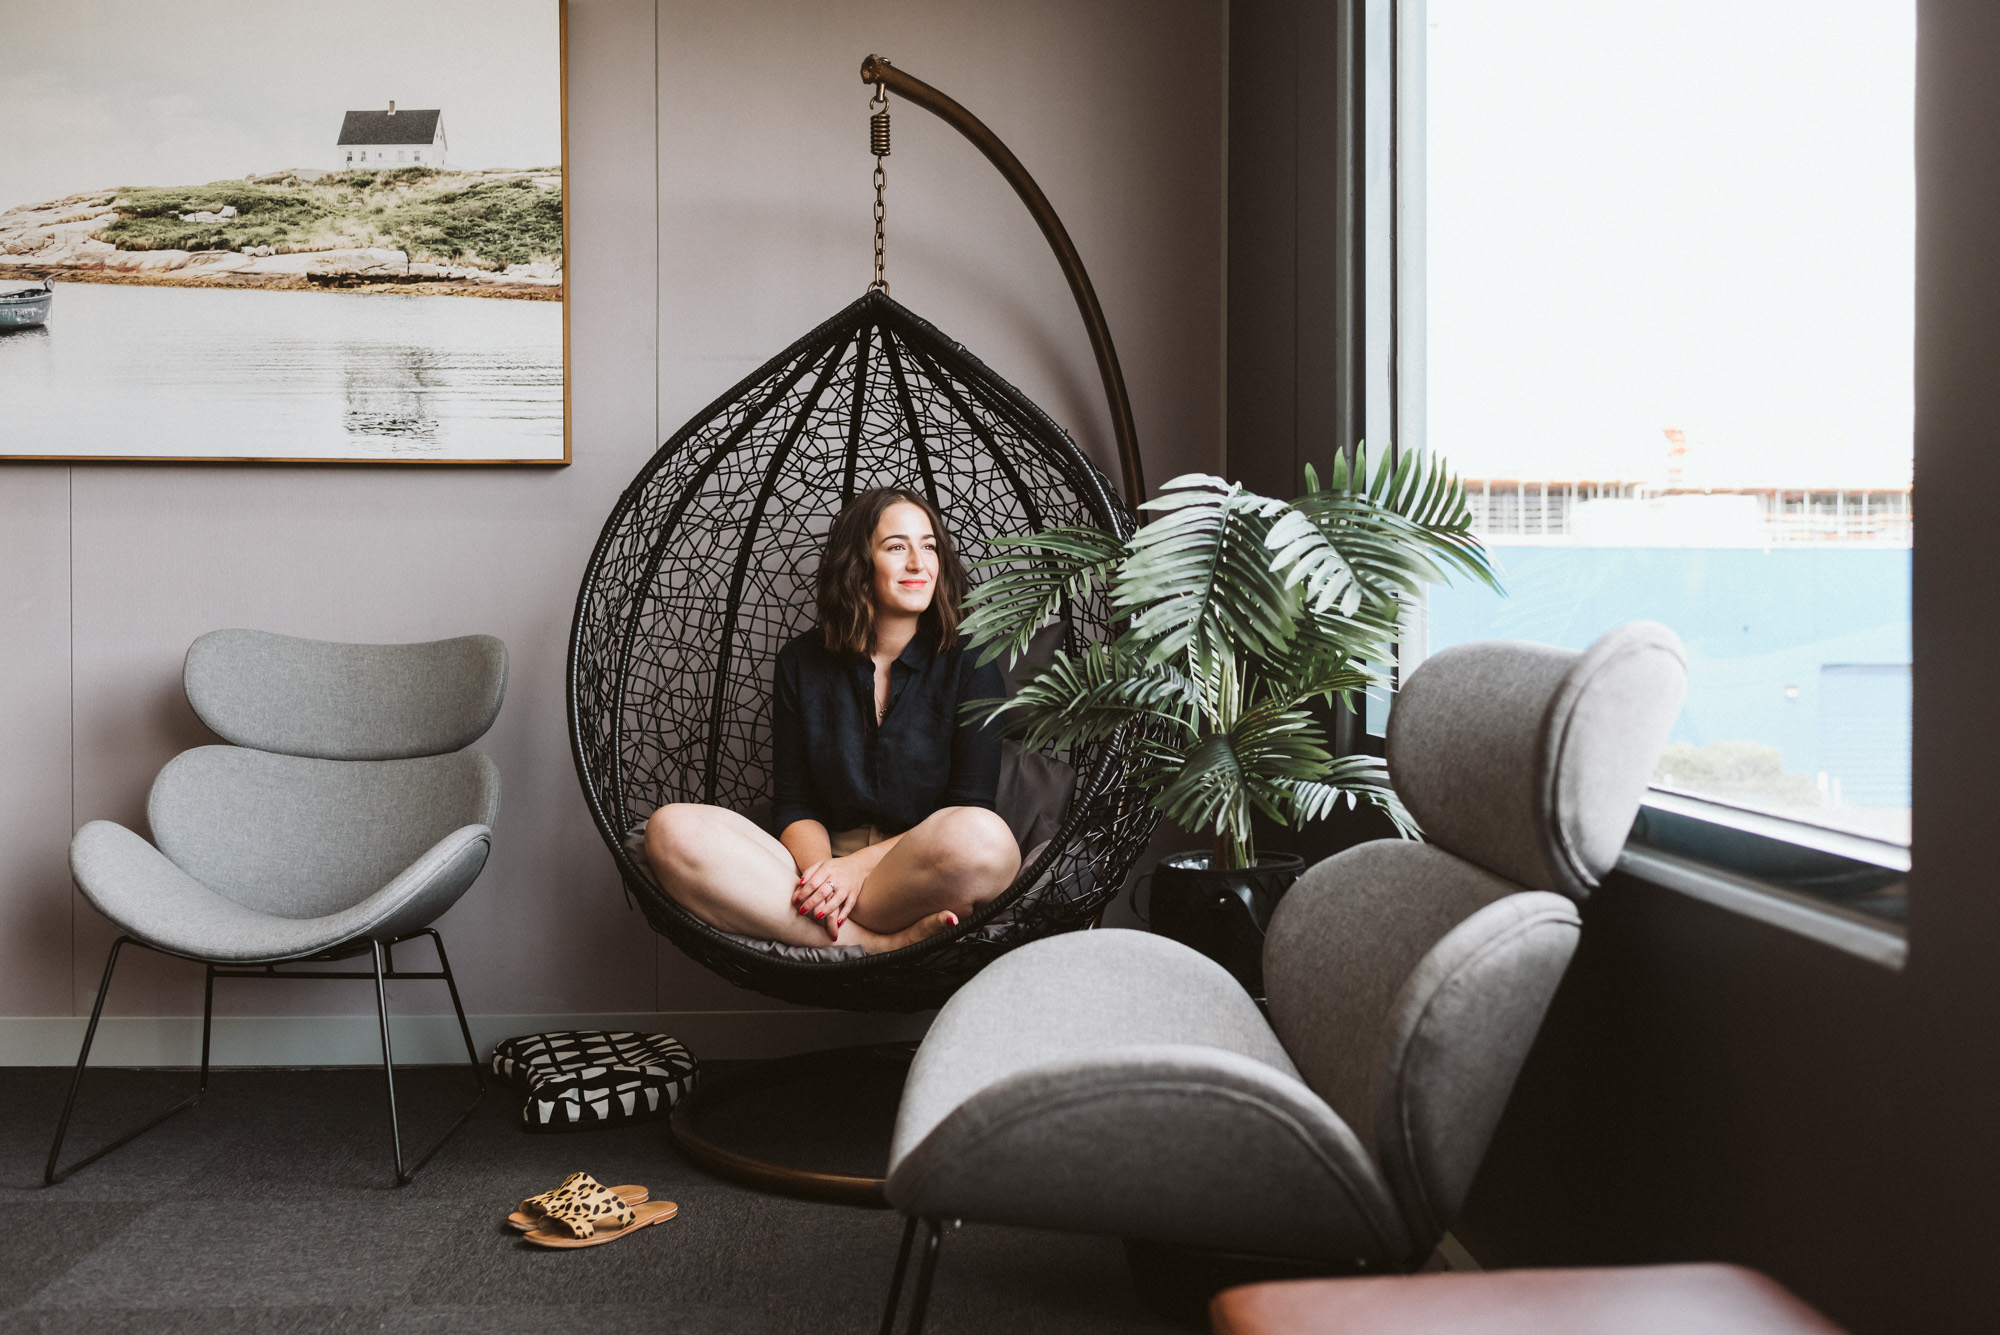 melbourne-australia-commercial-lifestyle-photographer-002.jpg